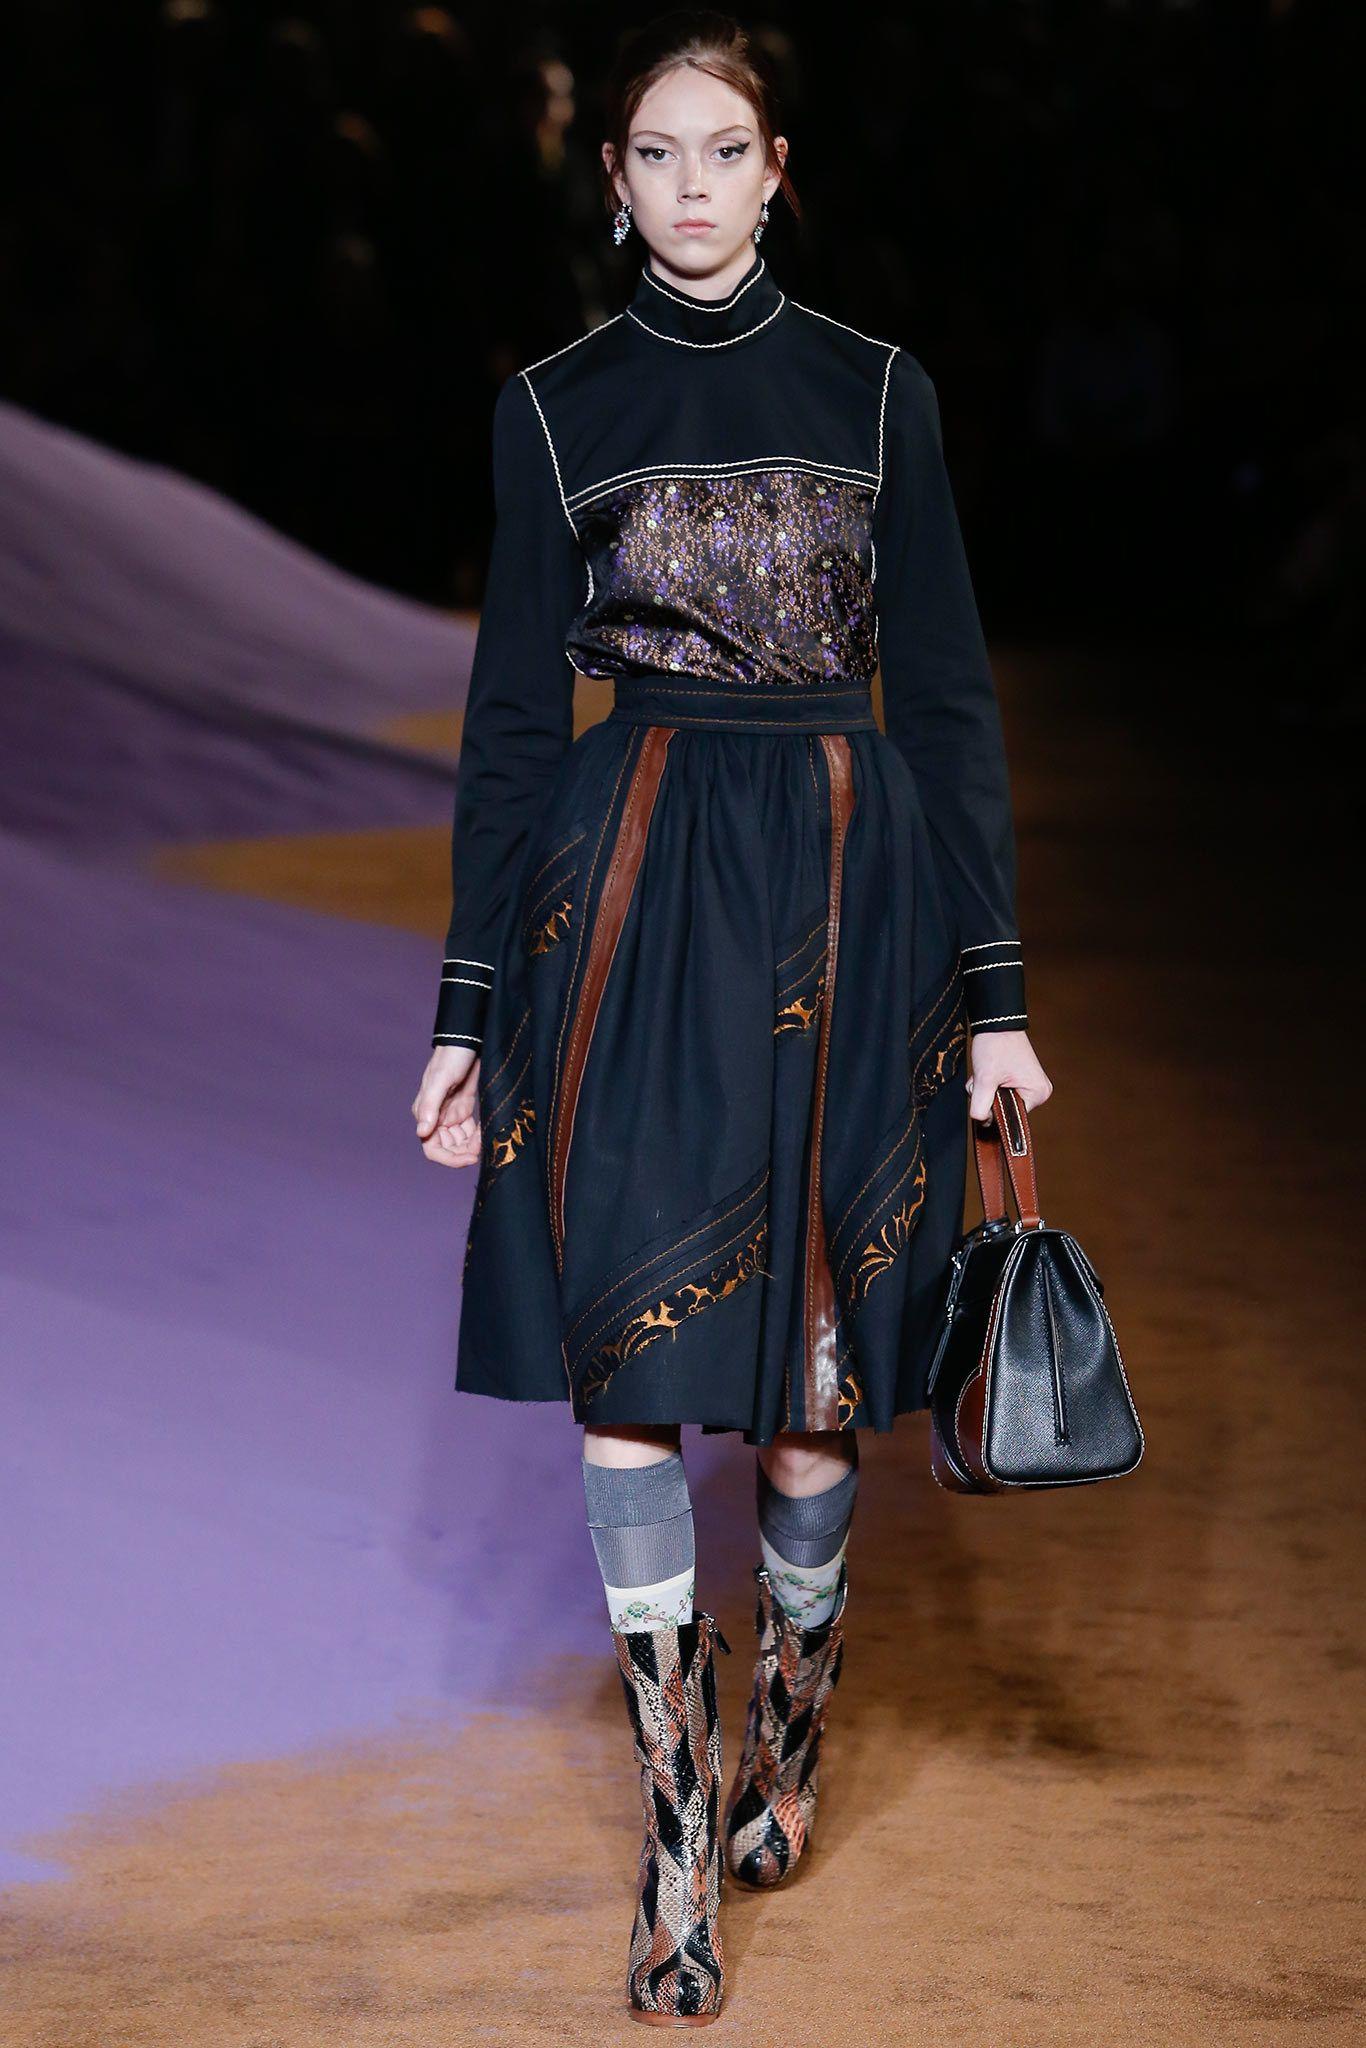 Prada Spring 2015 Ready-to-Wear Fashion Show - Natalie Westling 1a33589961d89